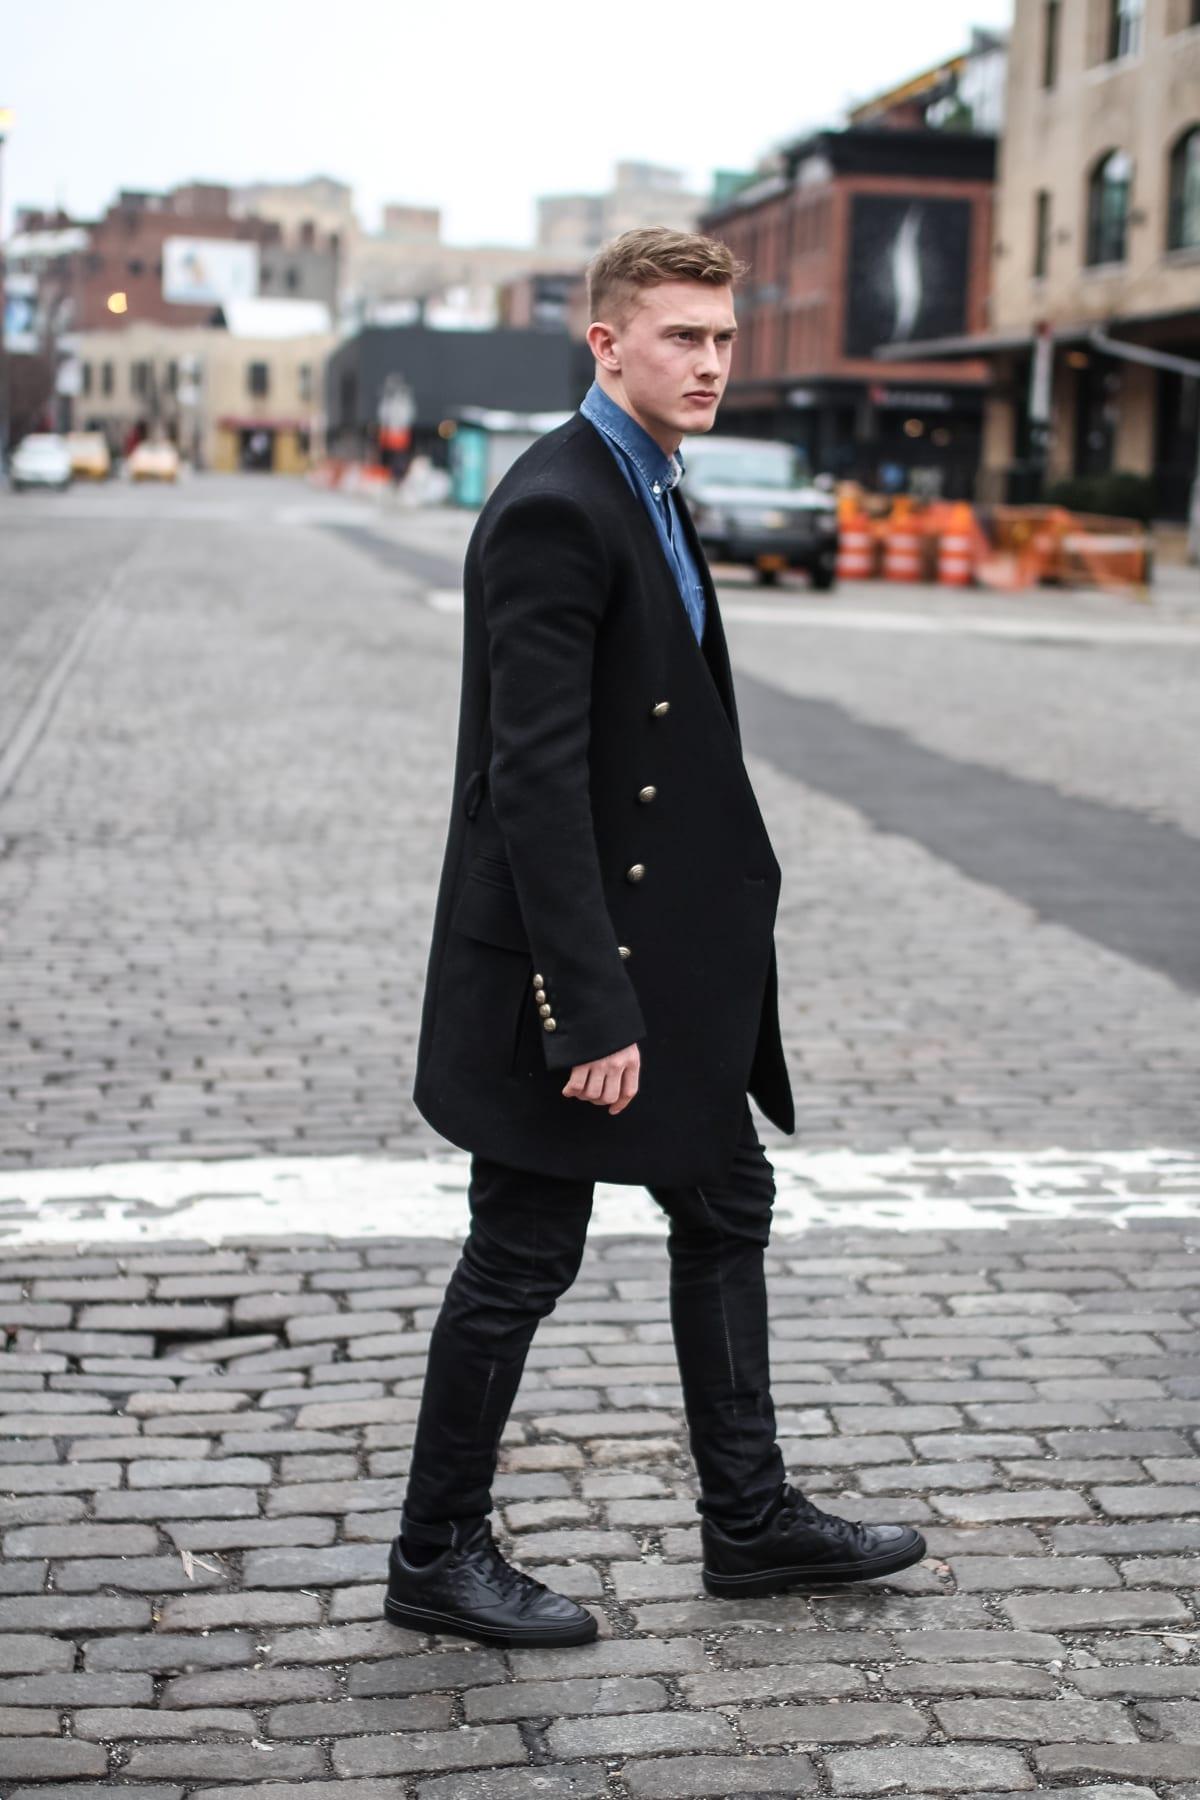 CK_1603_constantlyk_new-york-travel-fashion-blog-4926